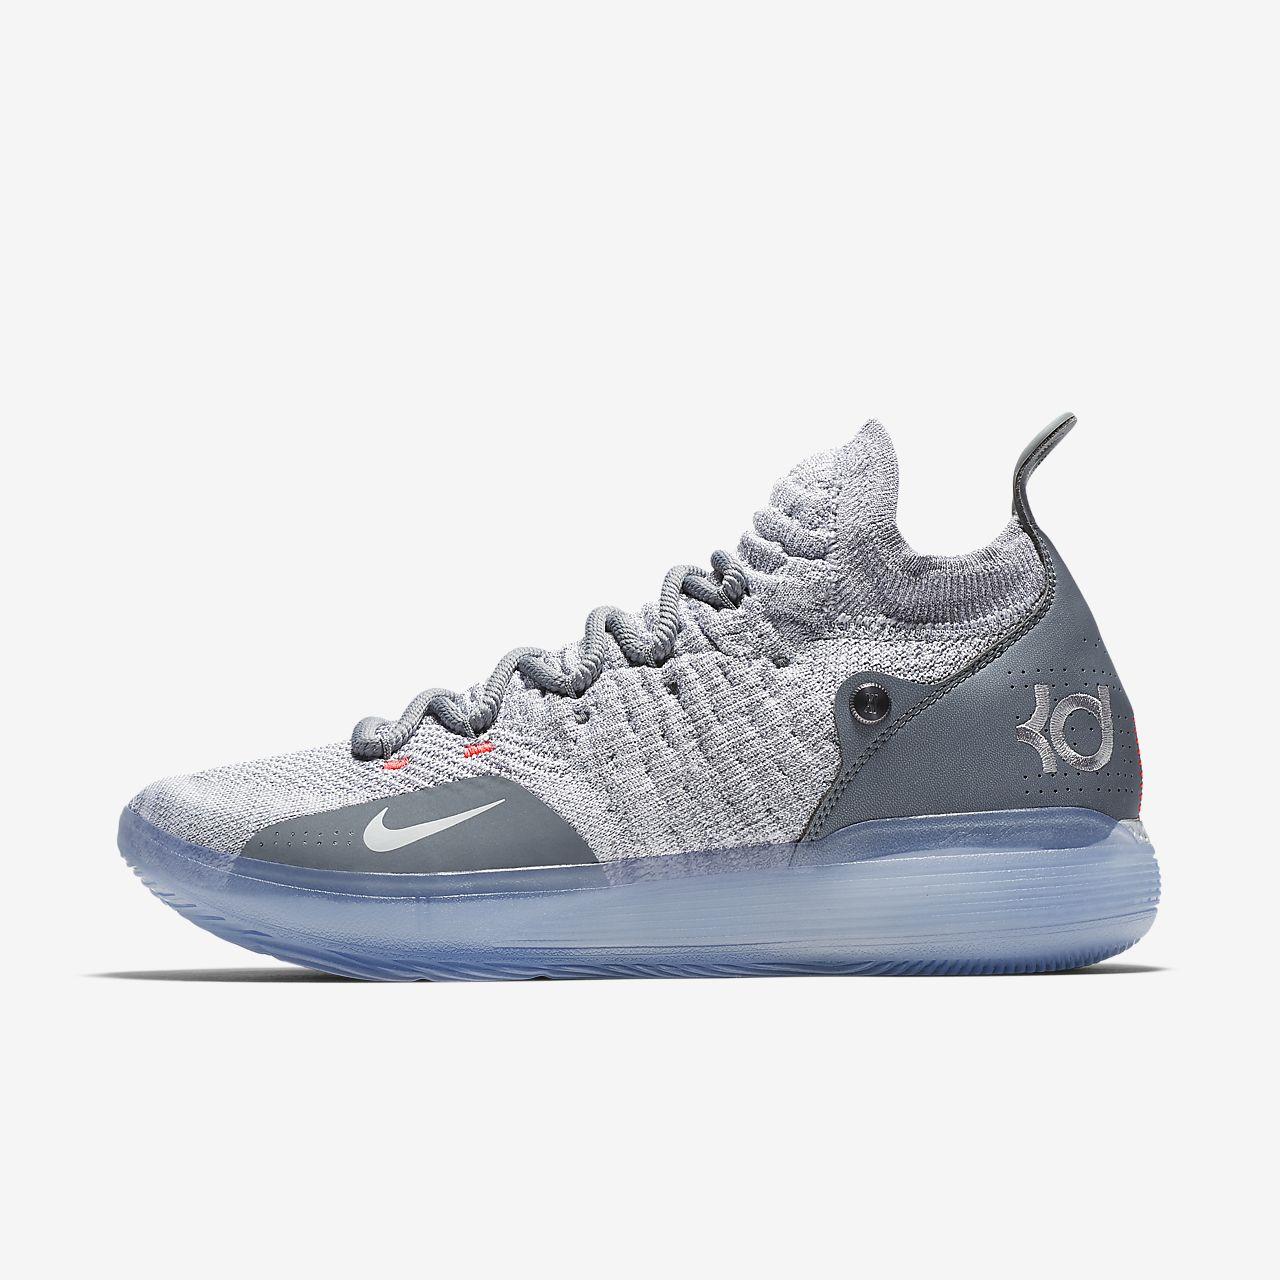 Nike Zoom KD11 EP 男子篮球鞋